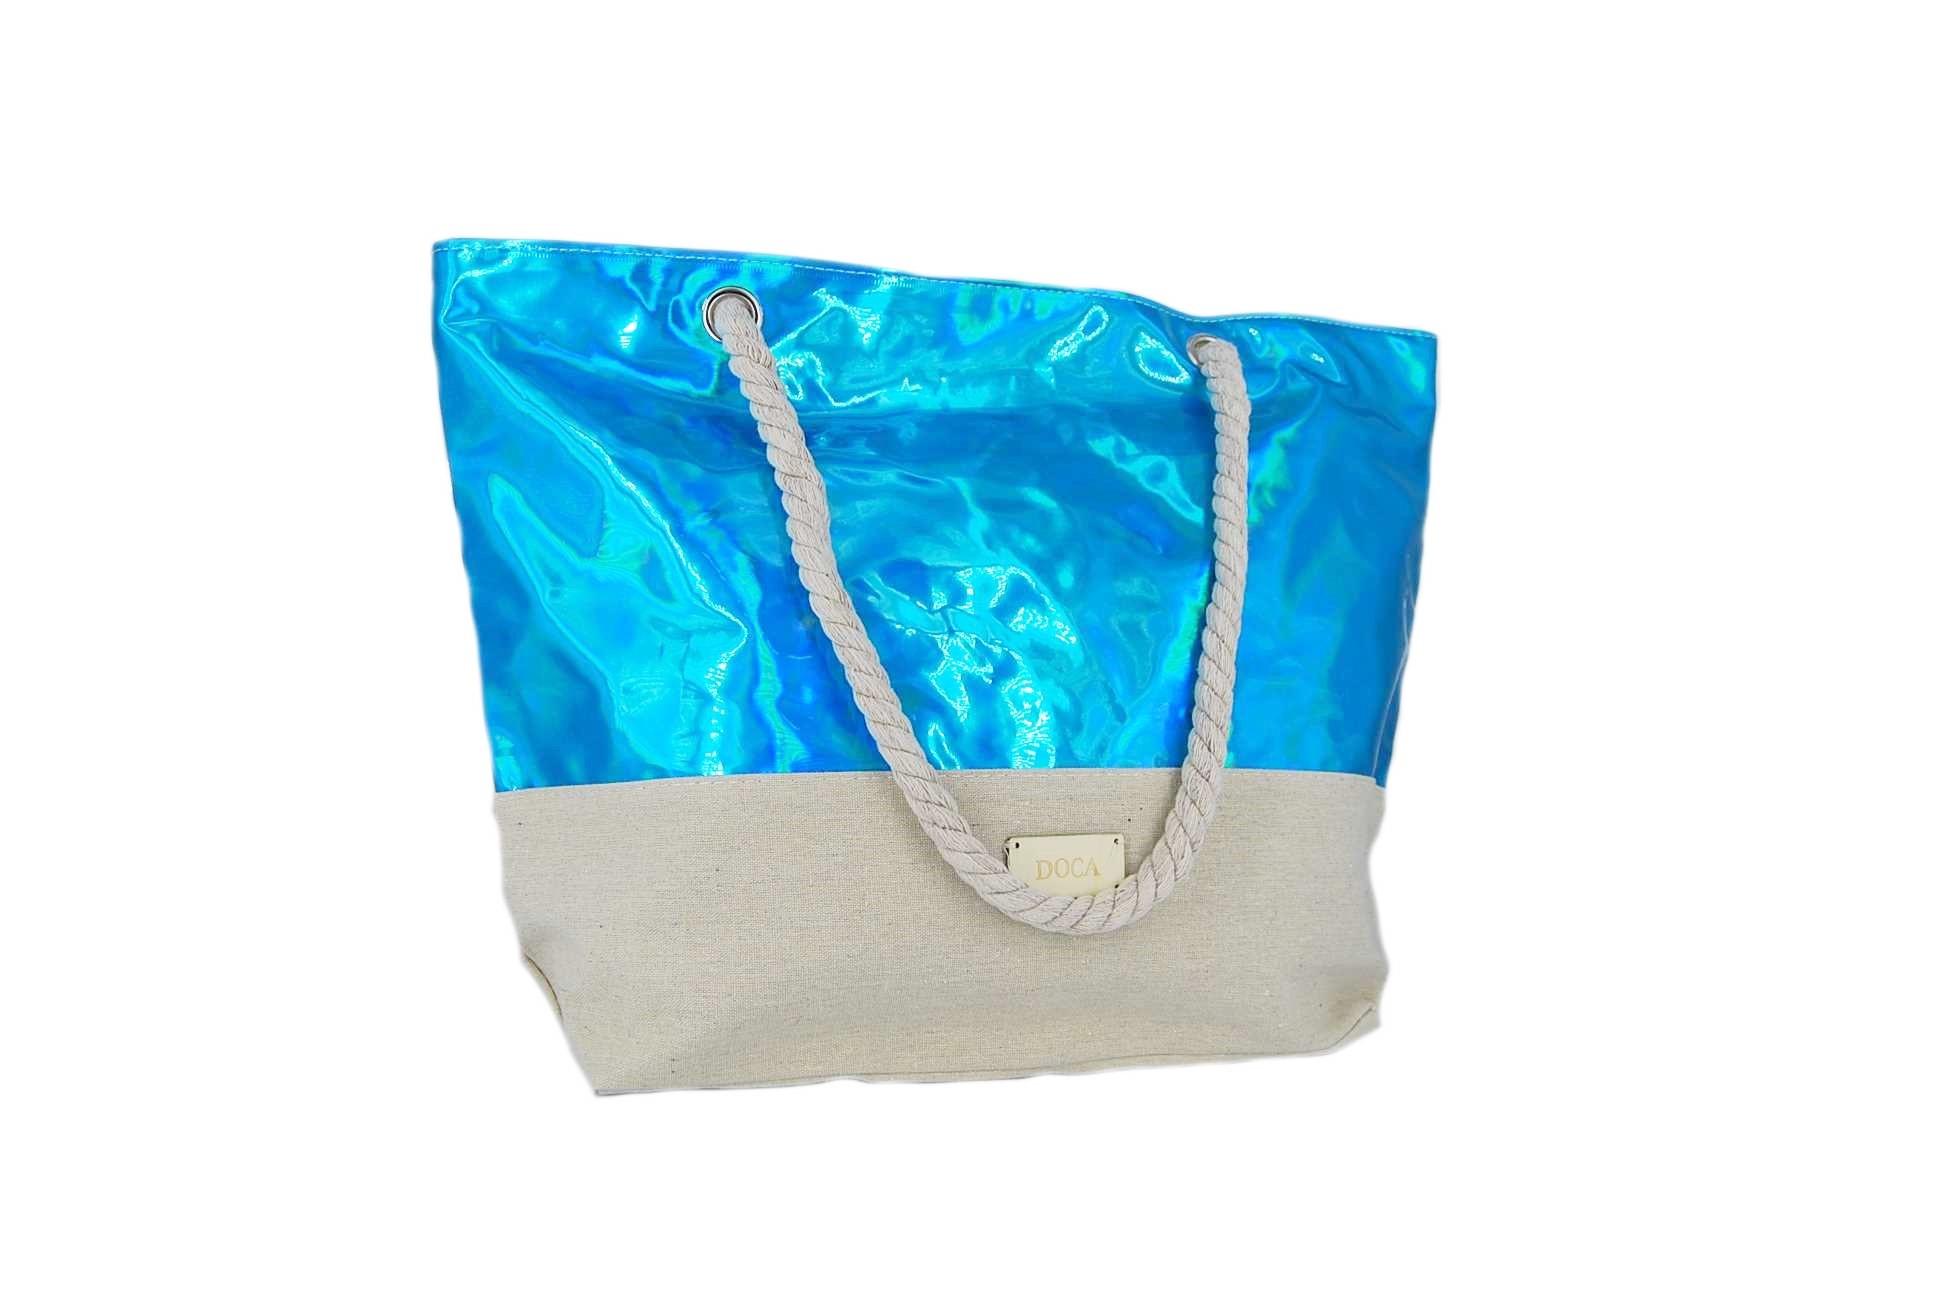 33a08550ce Doca τσάντα θαλάσσης γυναικεία μπλε ιριδίζον